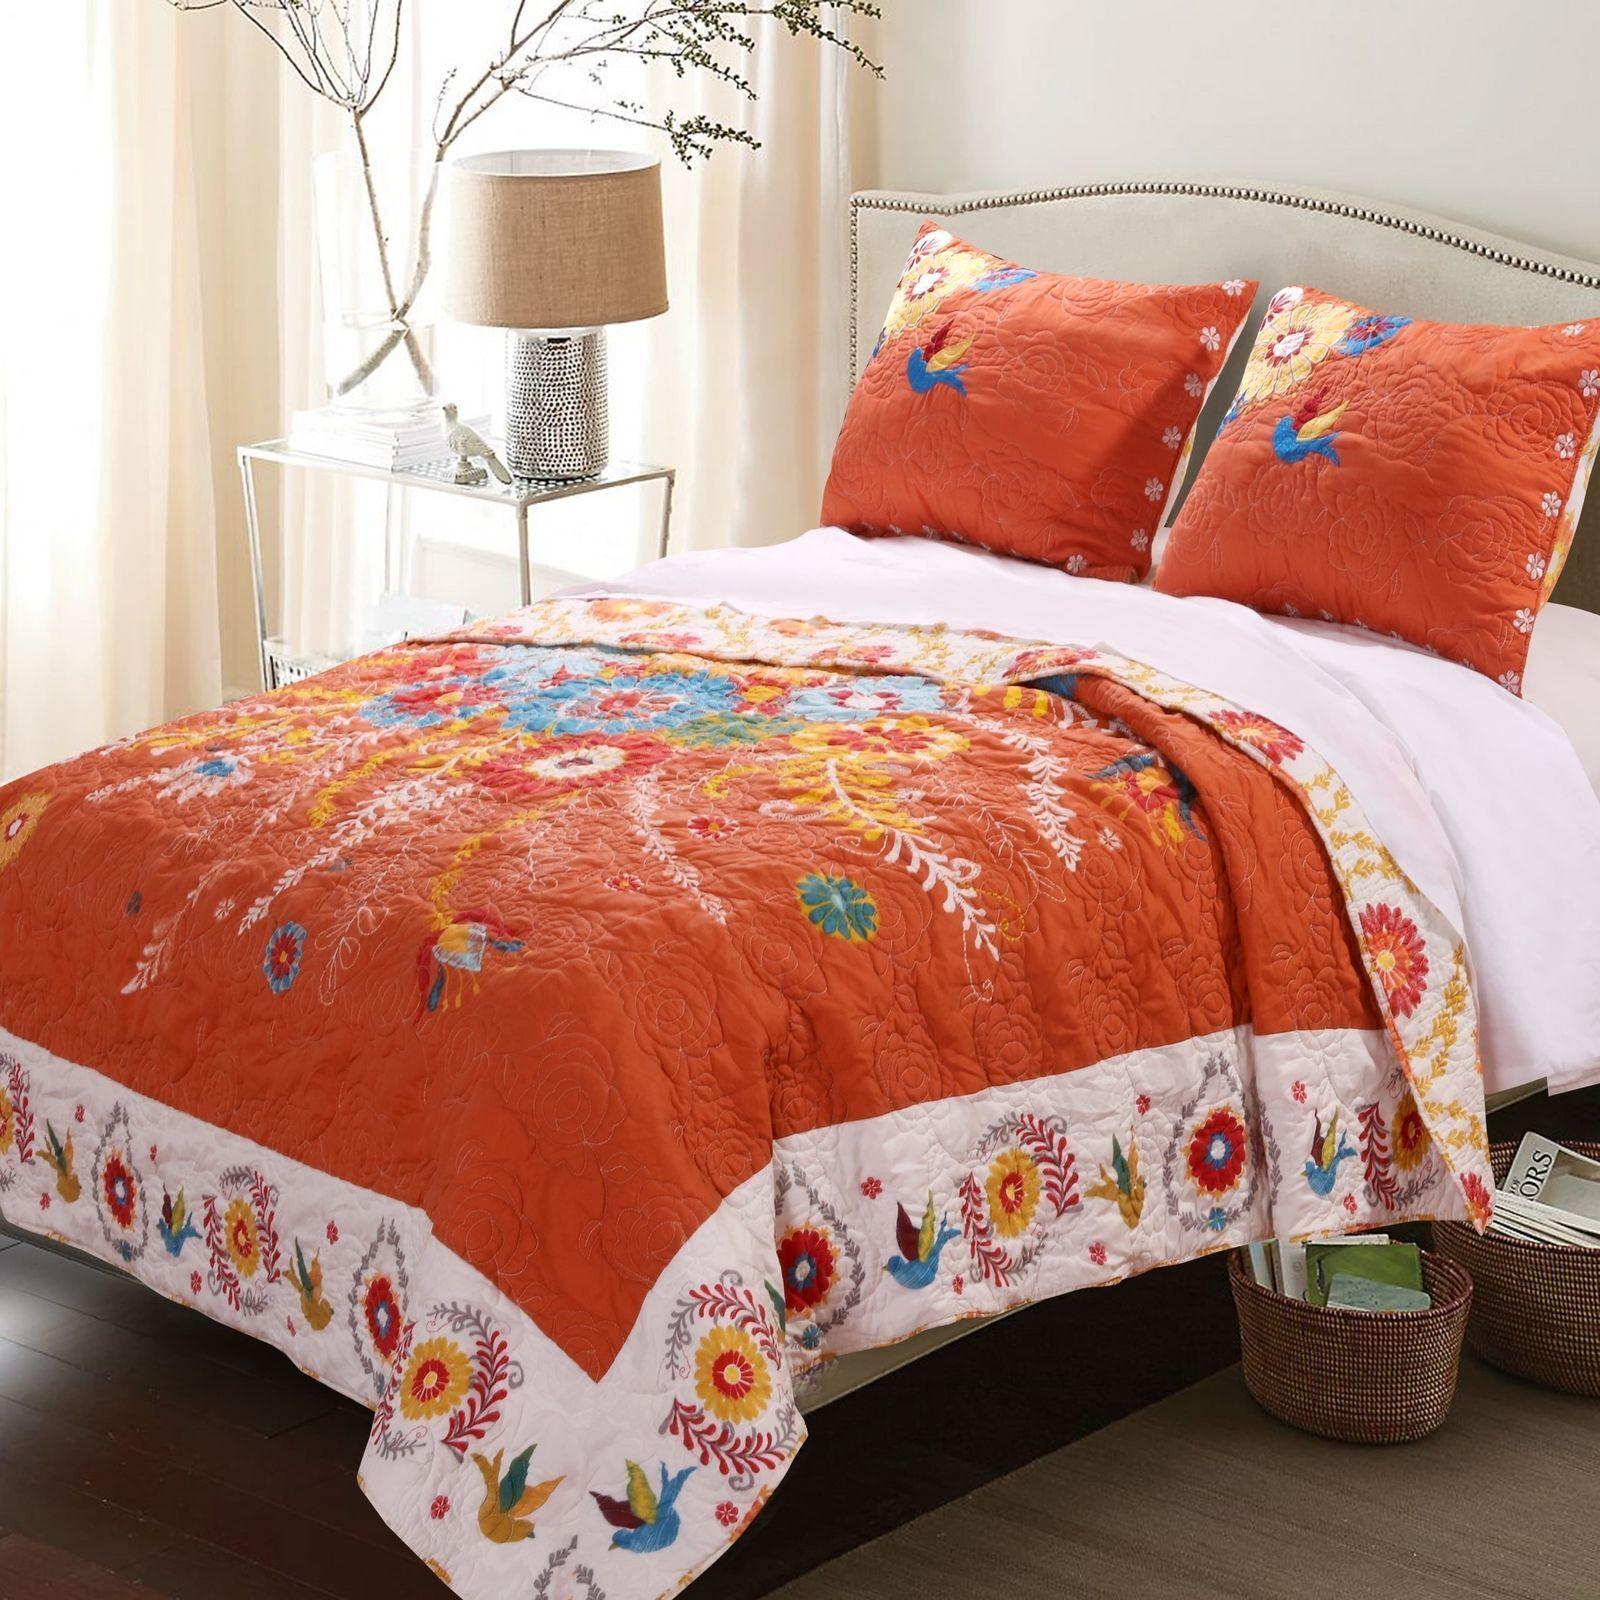 king size bohemian floral oversized orange folk